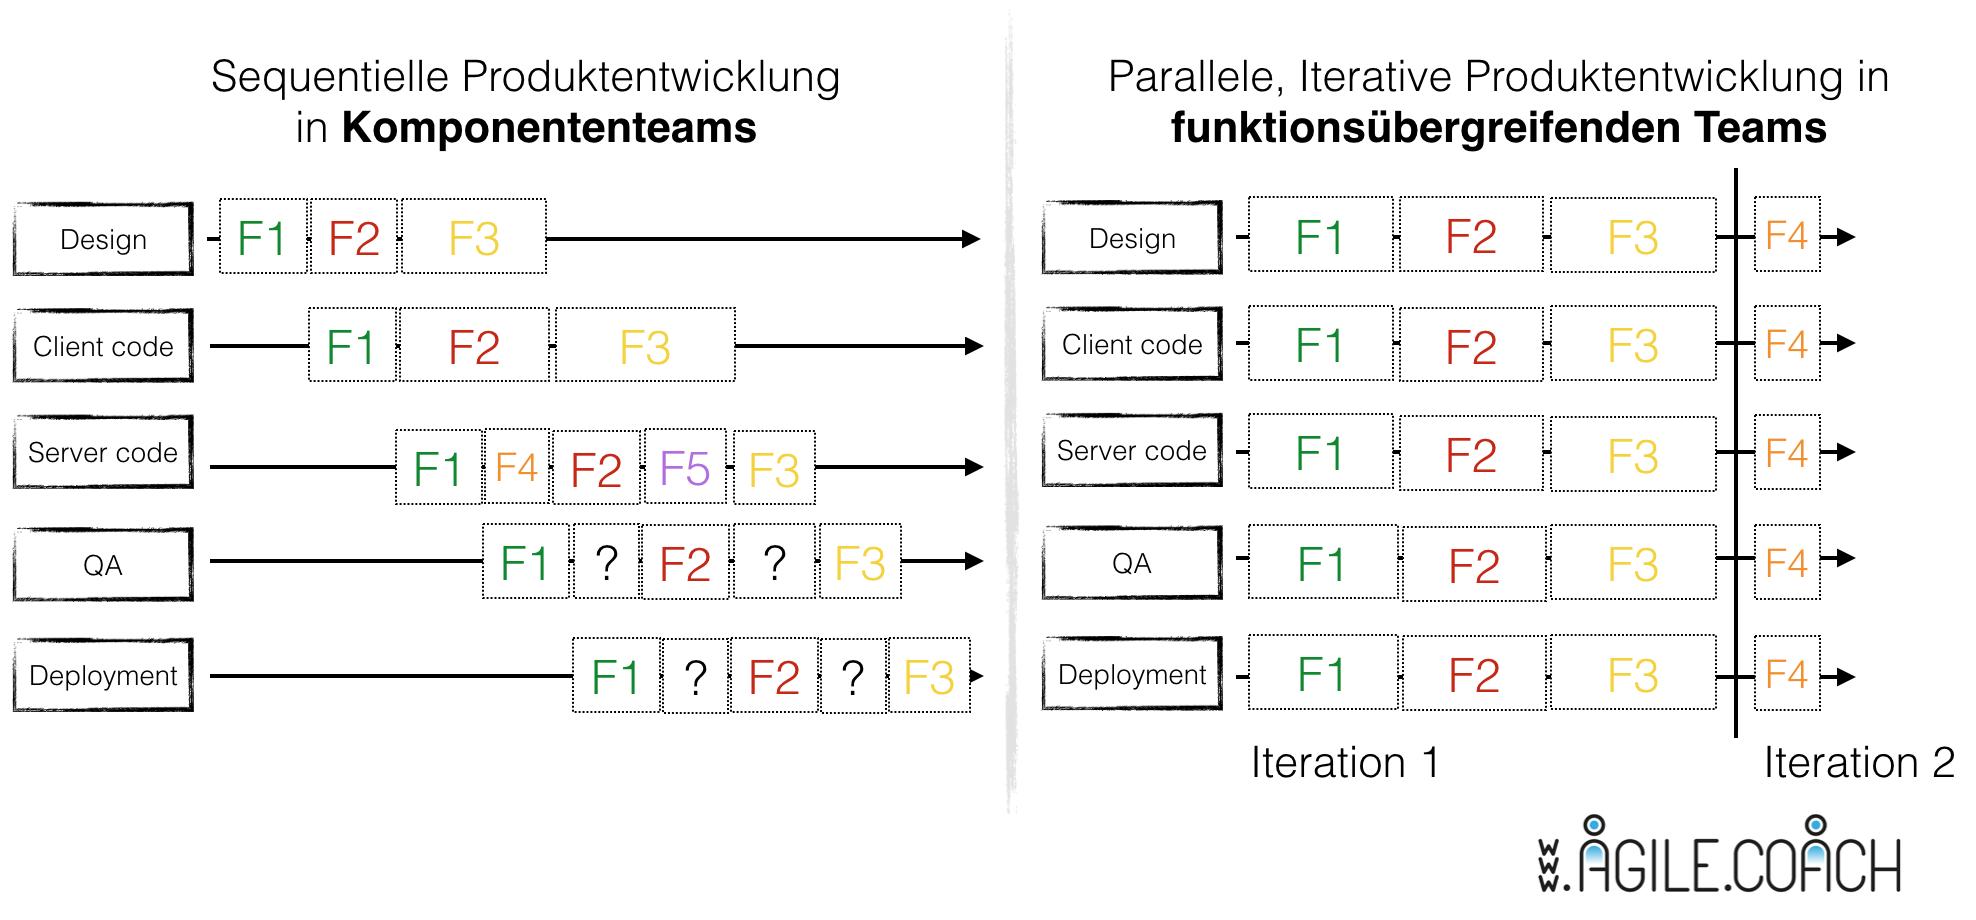 Scrum vs. Waterfall, Component-vs-crossfunctional-teams